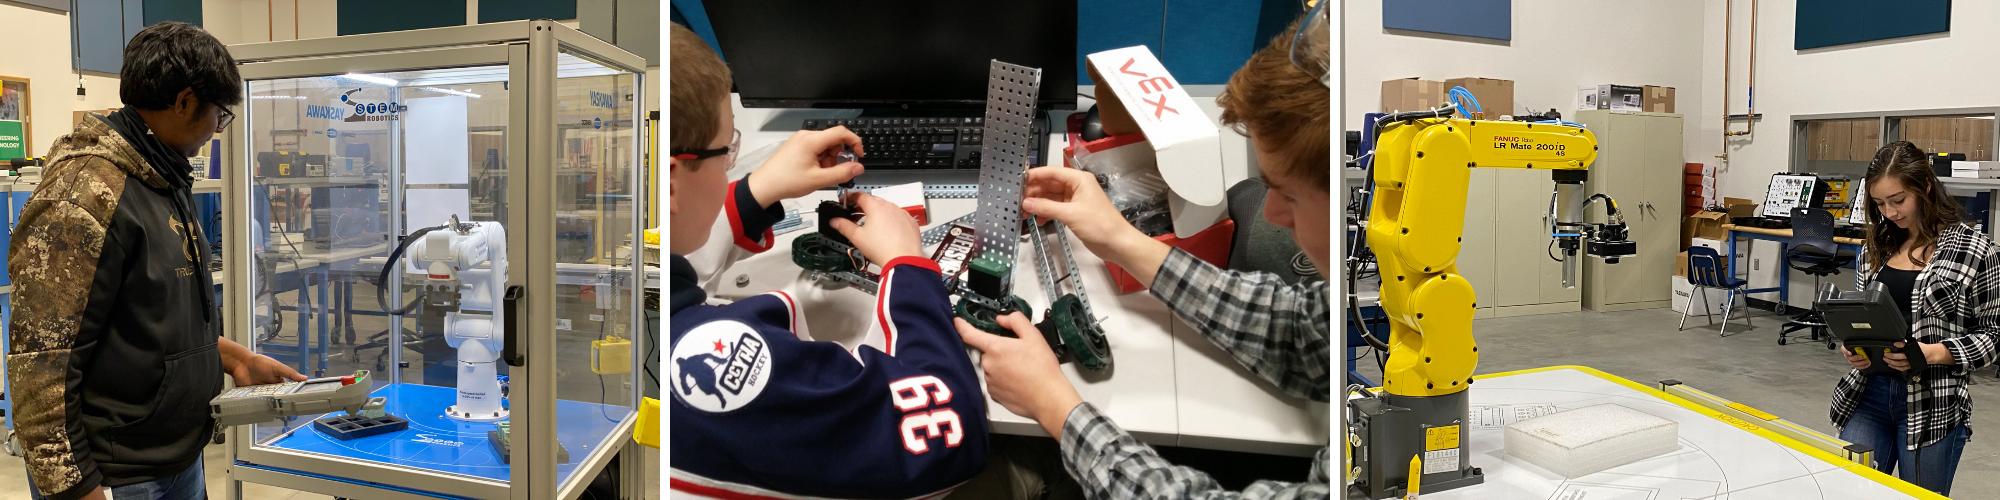 Engineering Robotics Lab Program